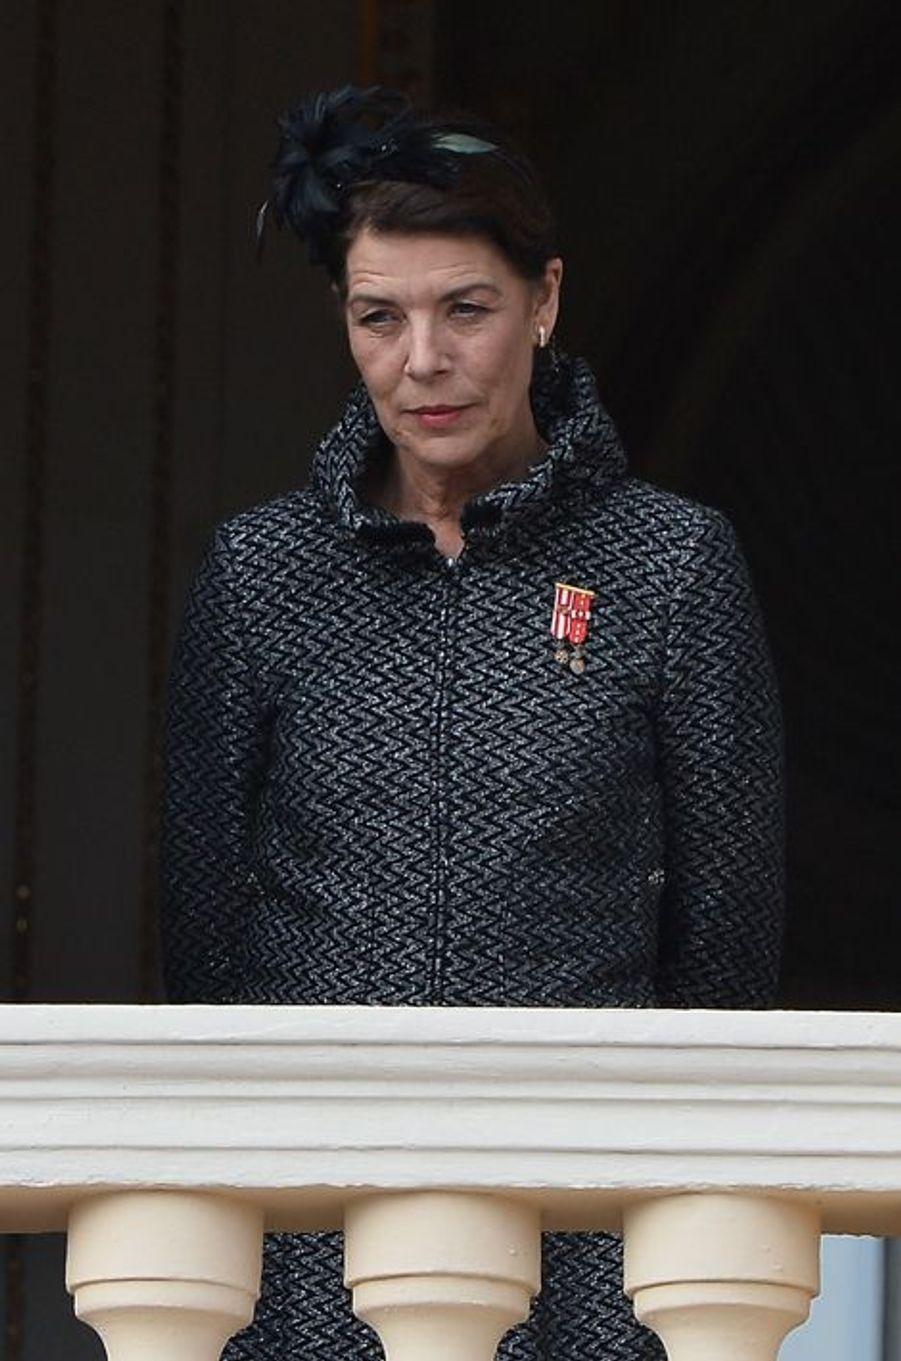 La princesse Caroline de Hanovre à Monaco, le 19 novembre 2015